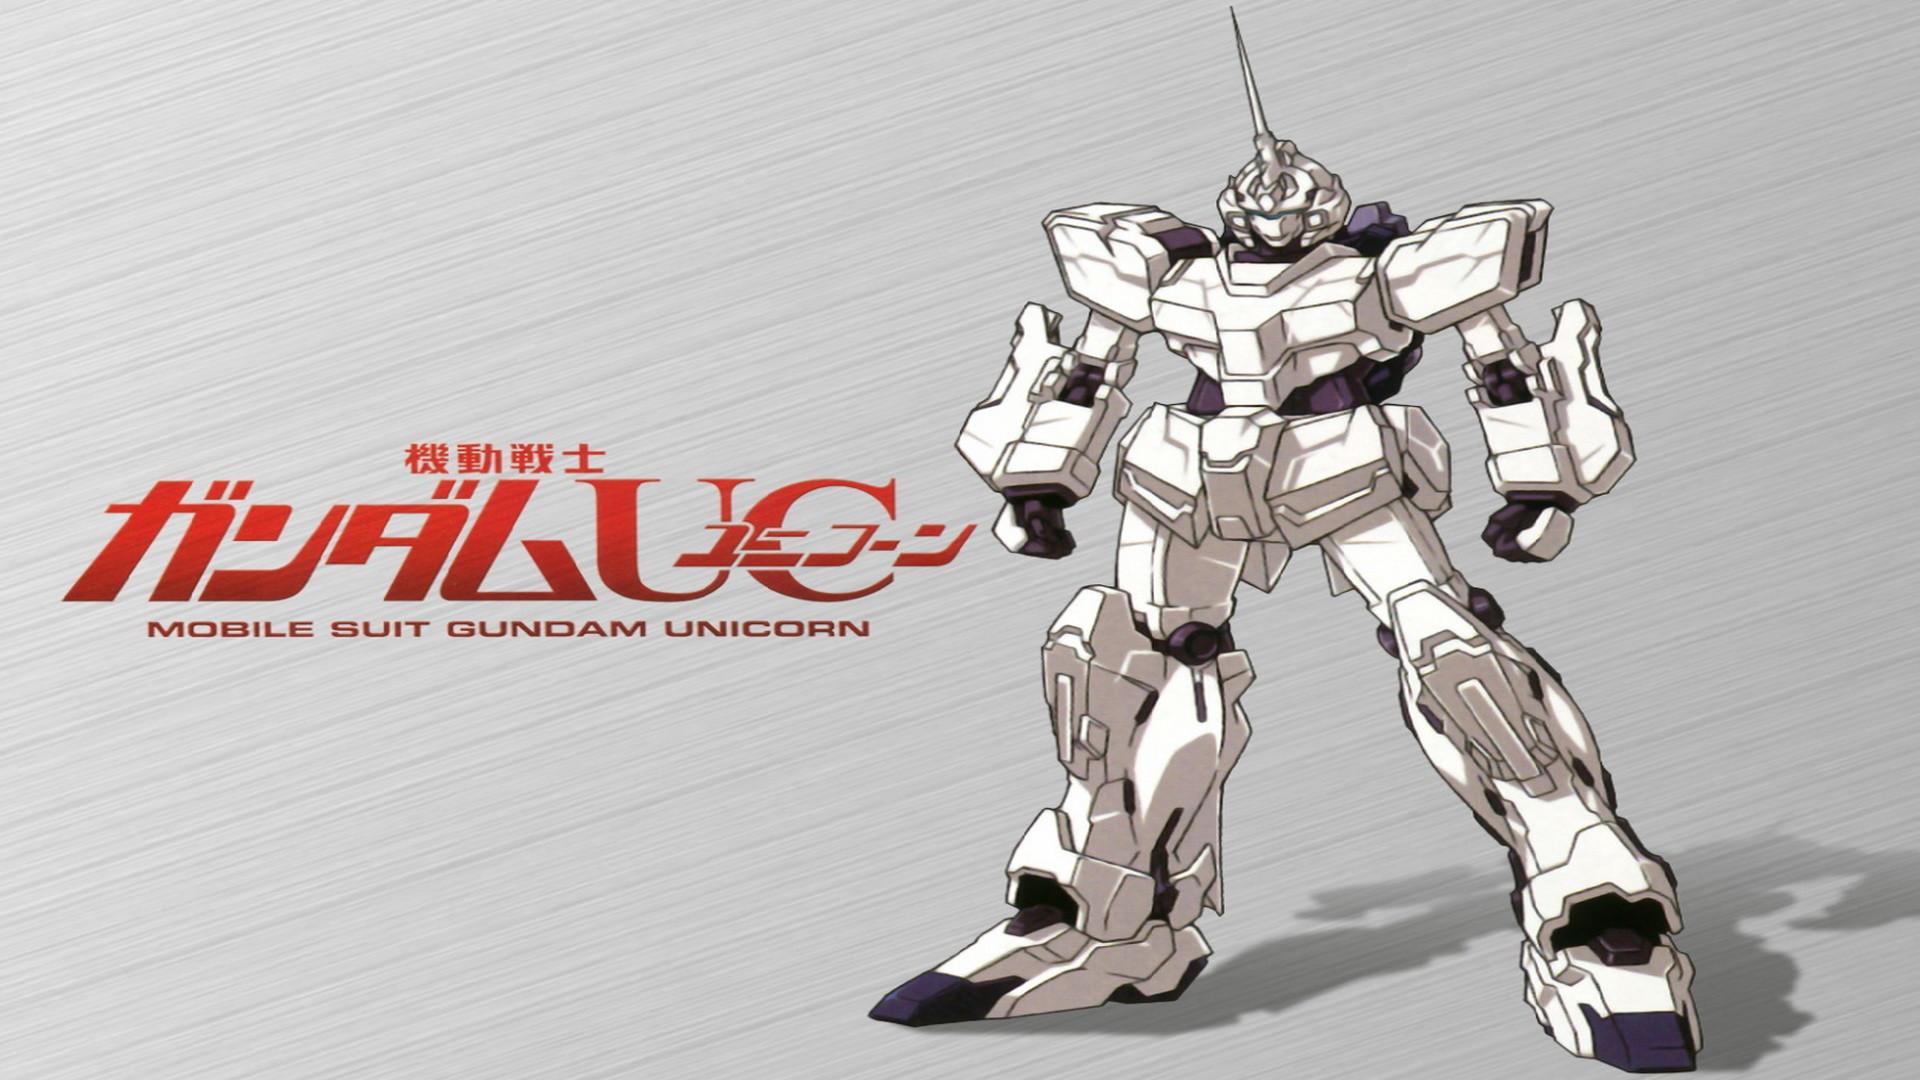 Gundam Unicorn Wallpapers 11, Wallpapers, HD Anime Wallpapers, Desktop .